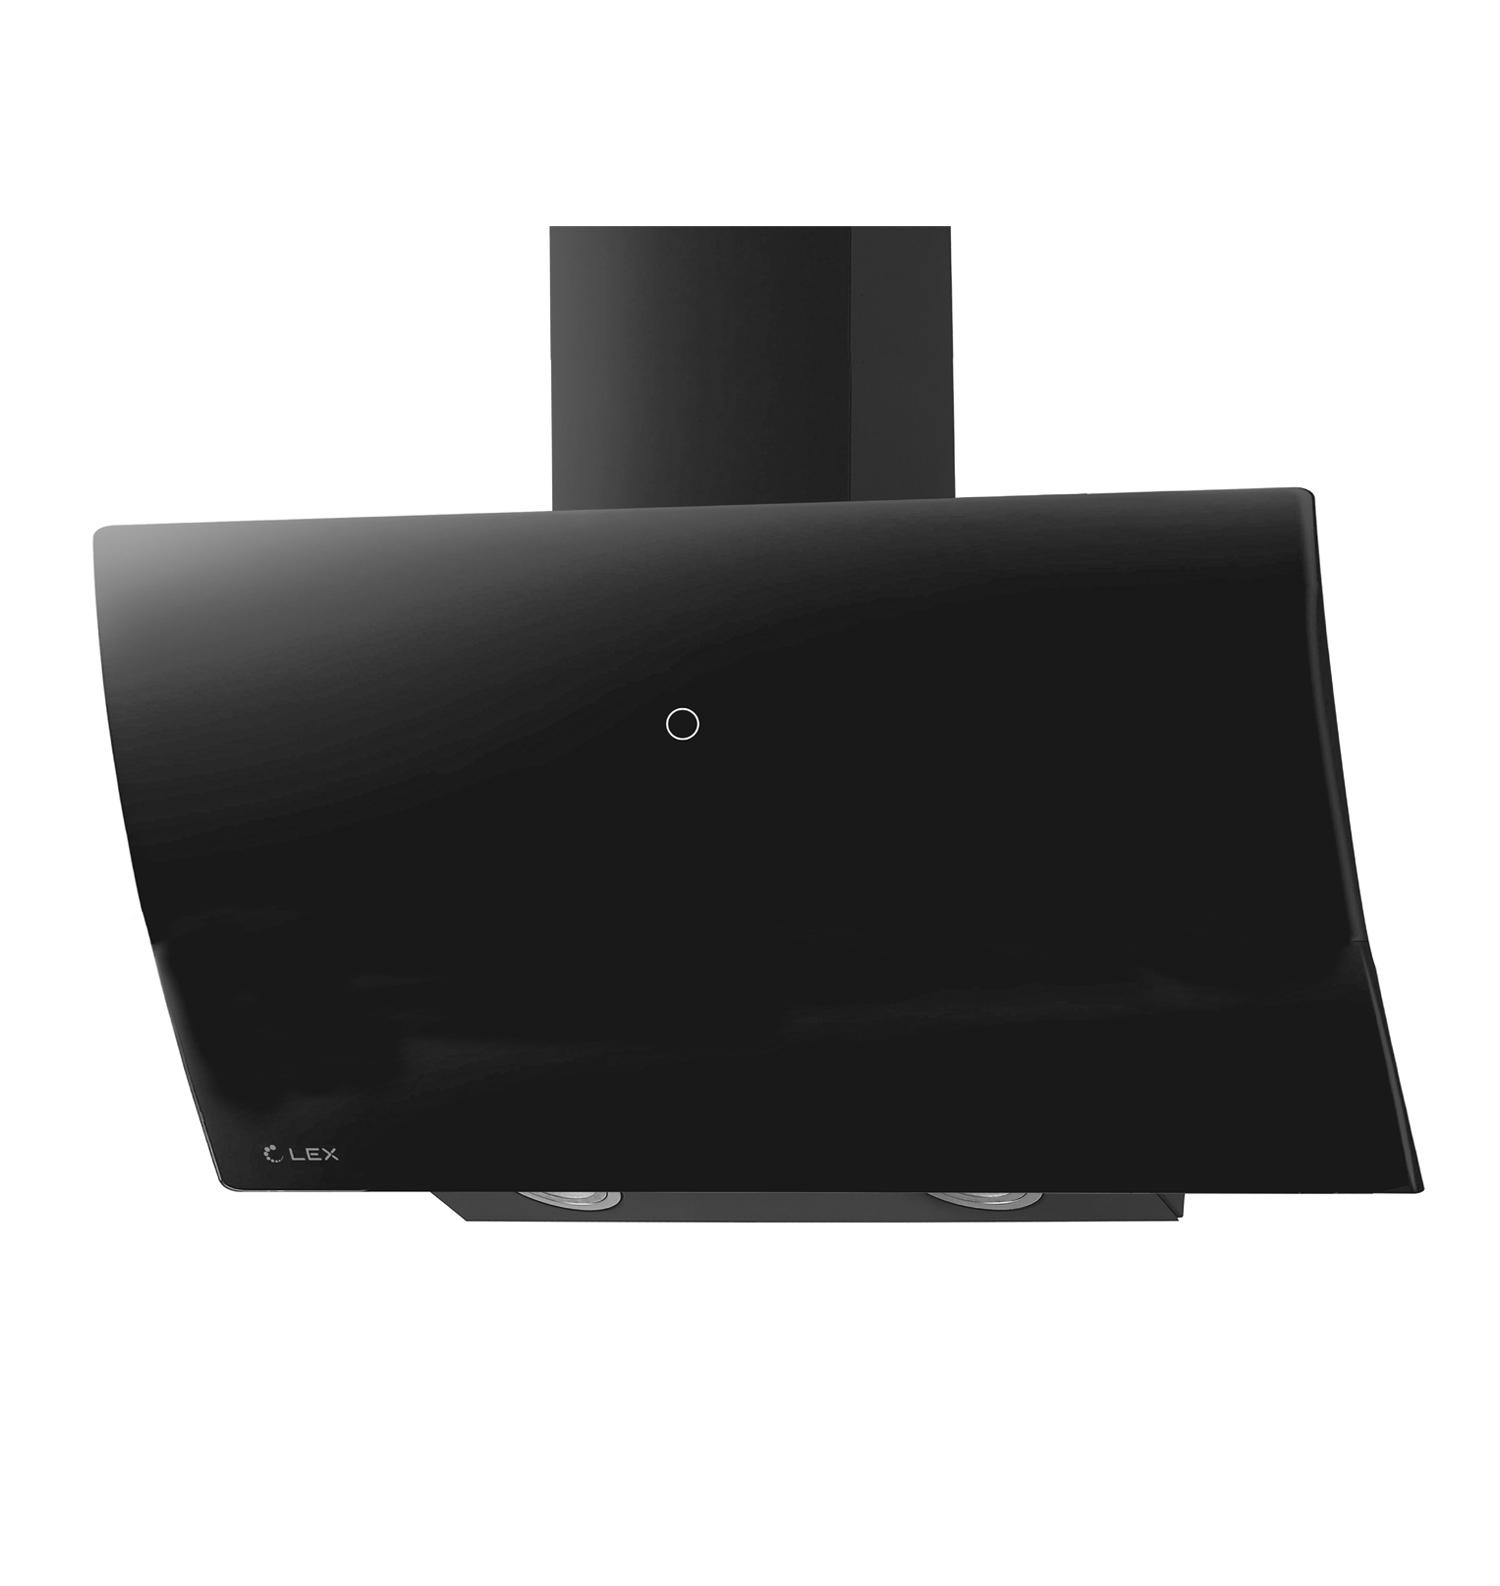 LEX Plaza GS 900 Black